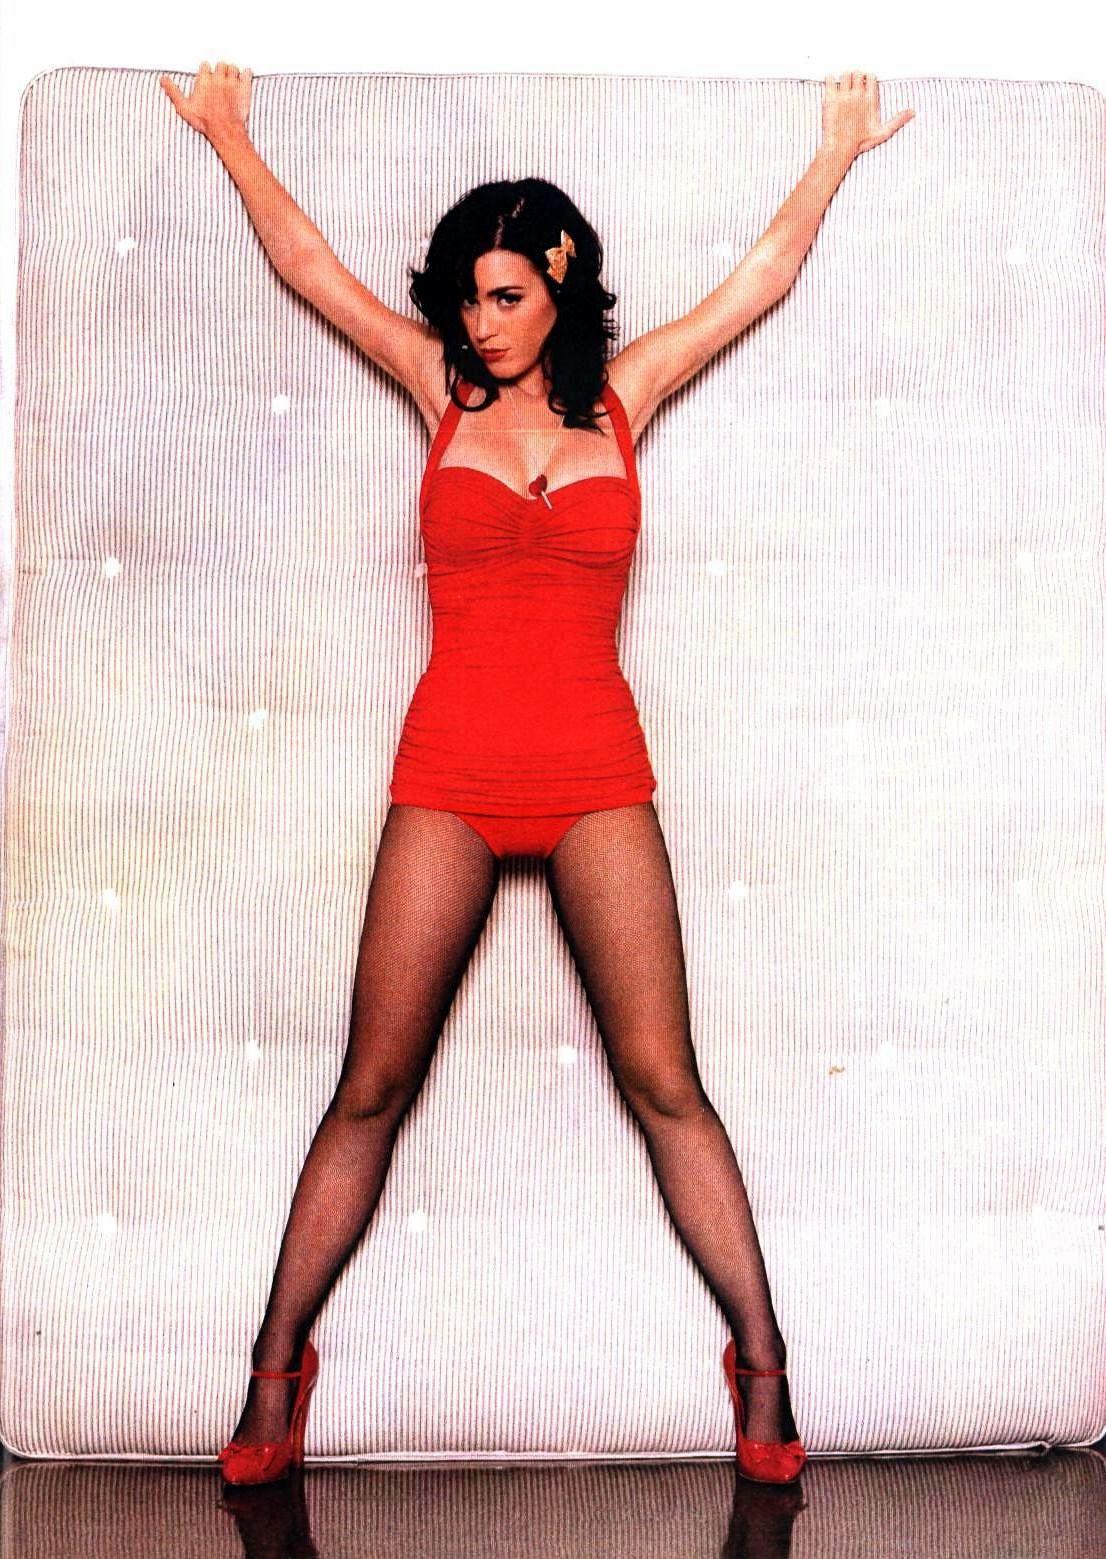 Katy Perrys Legs  Celeb Singer  Katy Perry Legs, Katy -9462